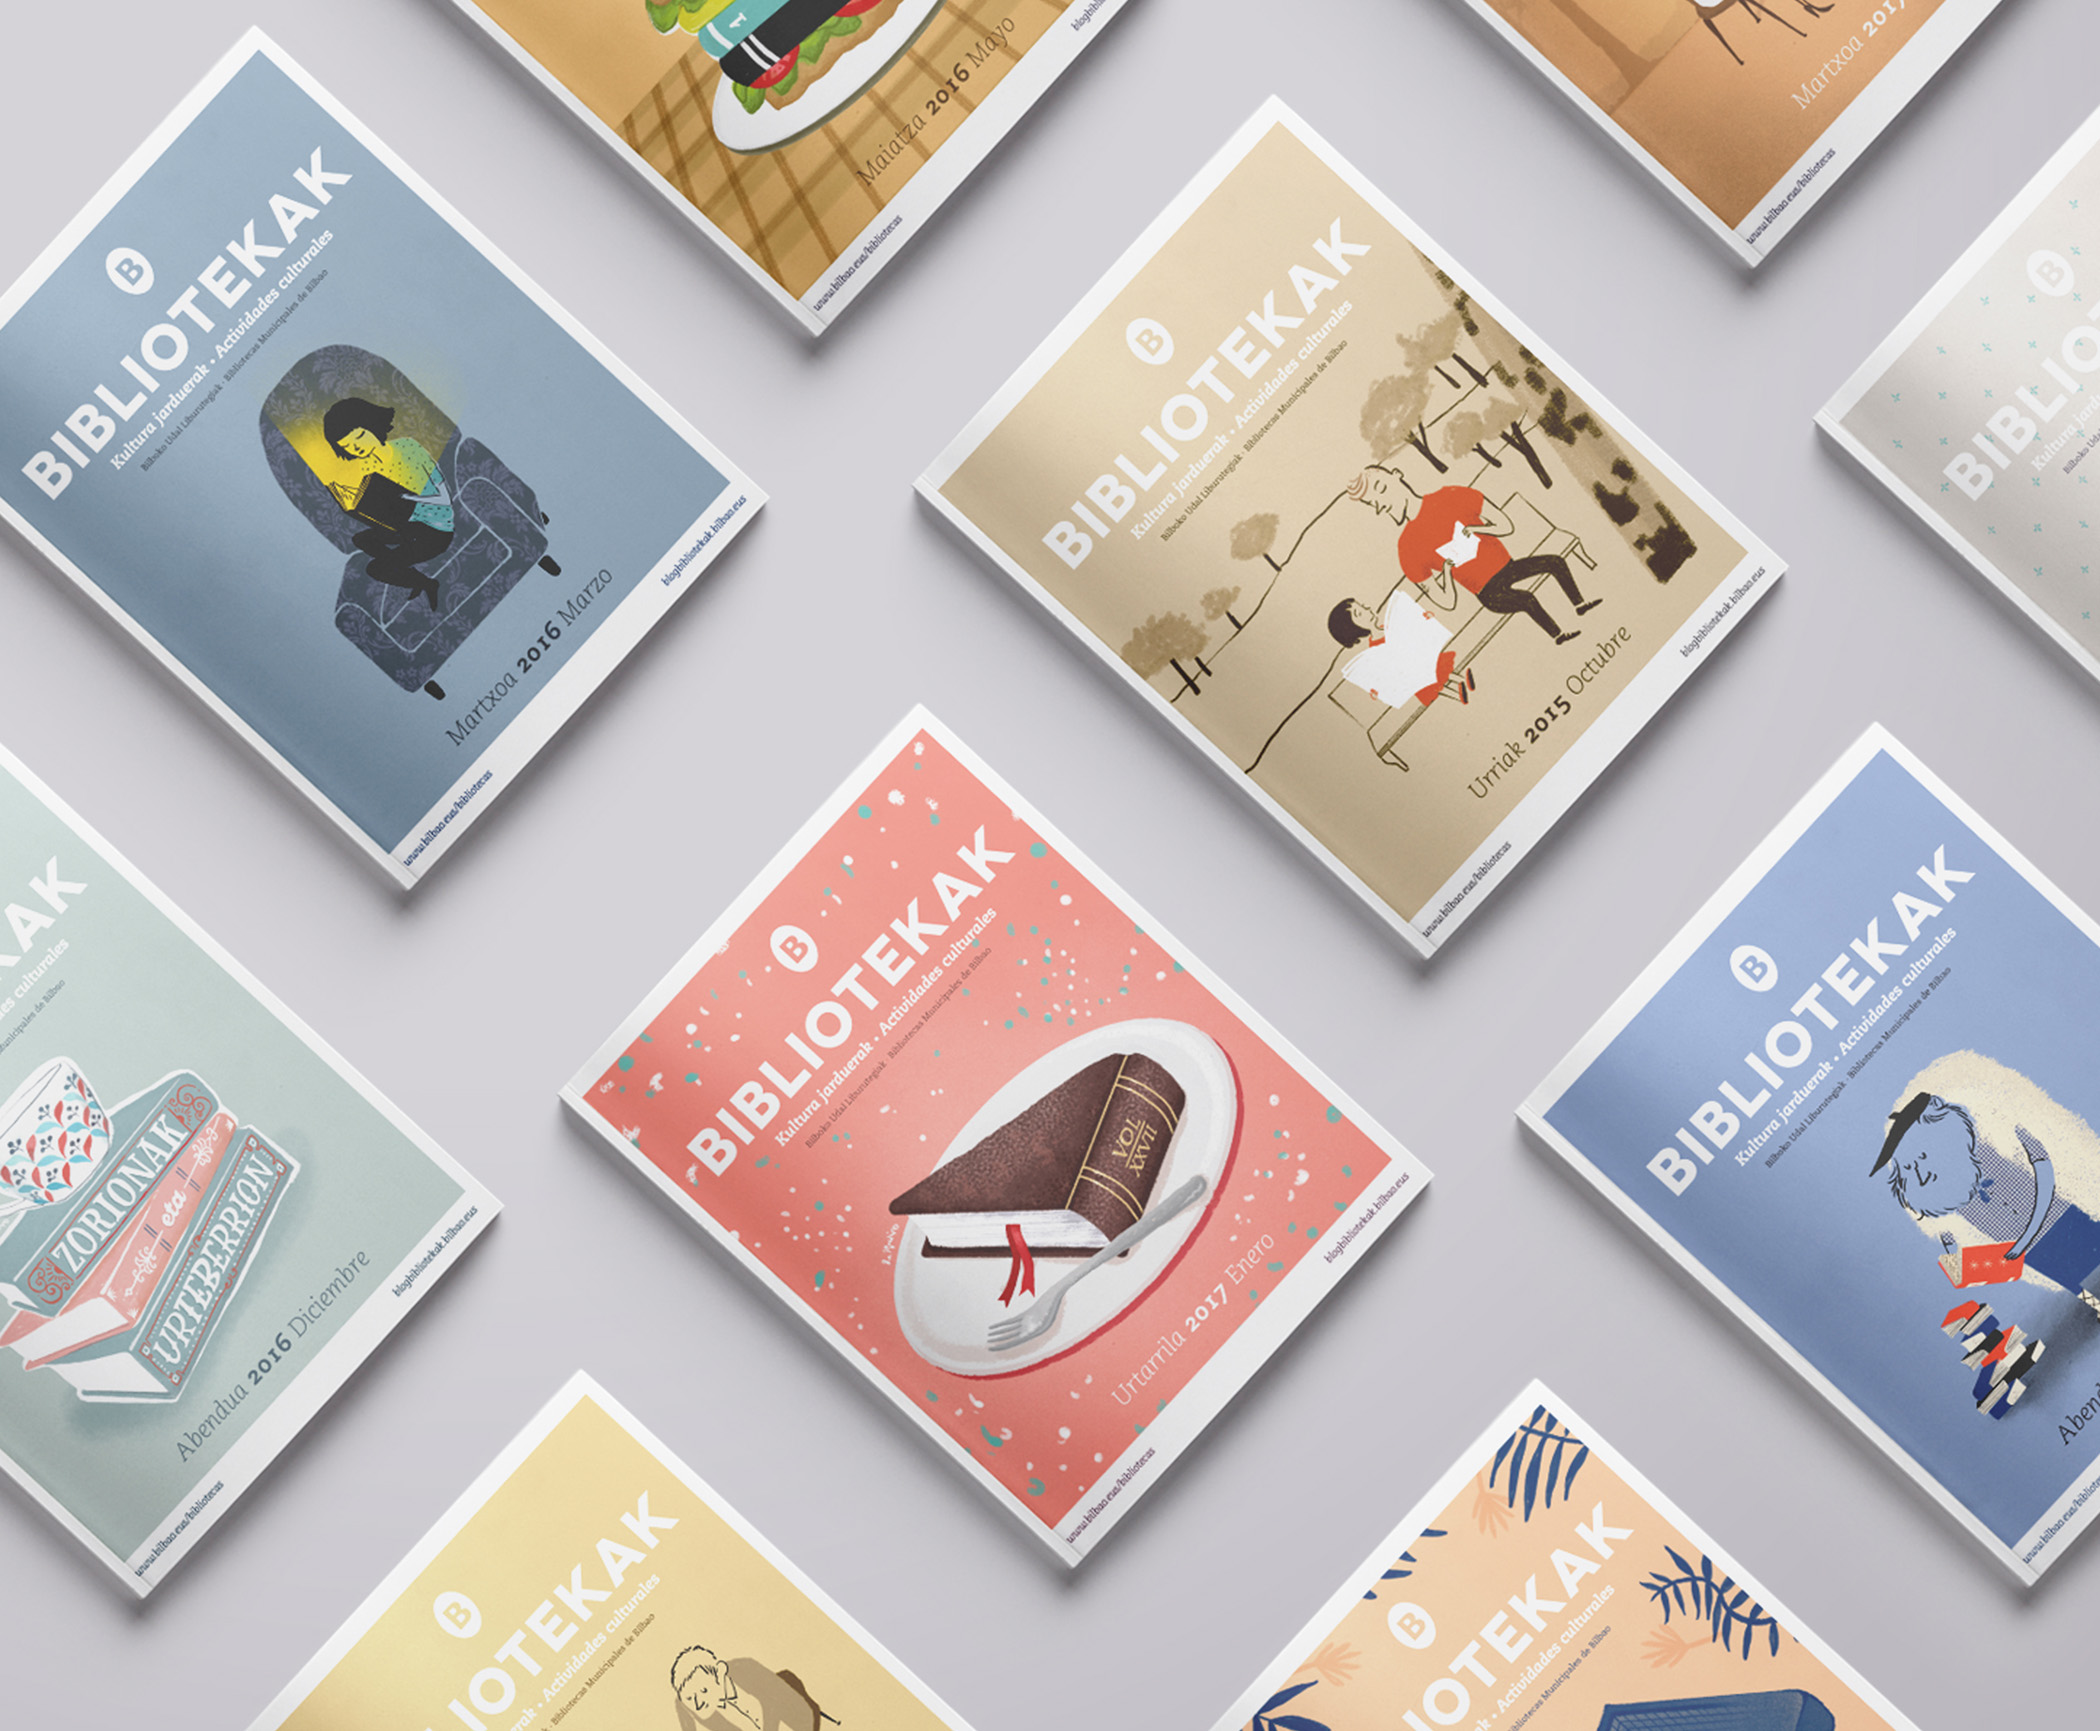 Folleto Mensual by Nagore M. Jauregi - Creative Work